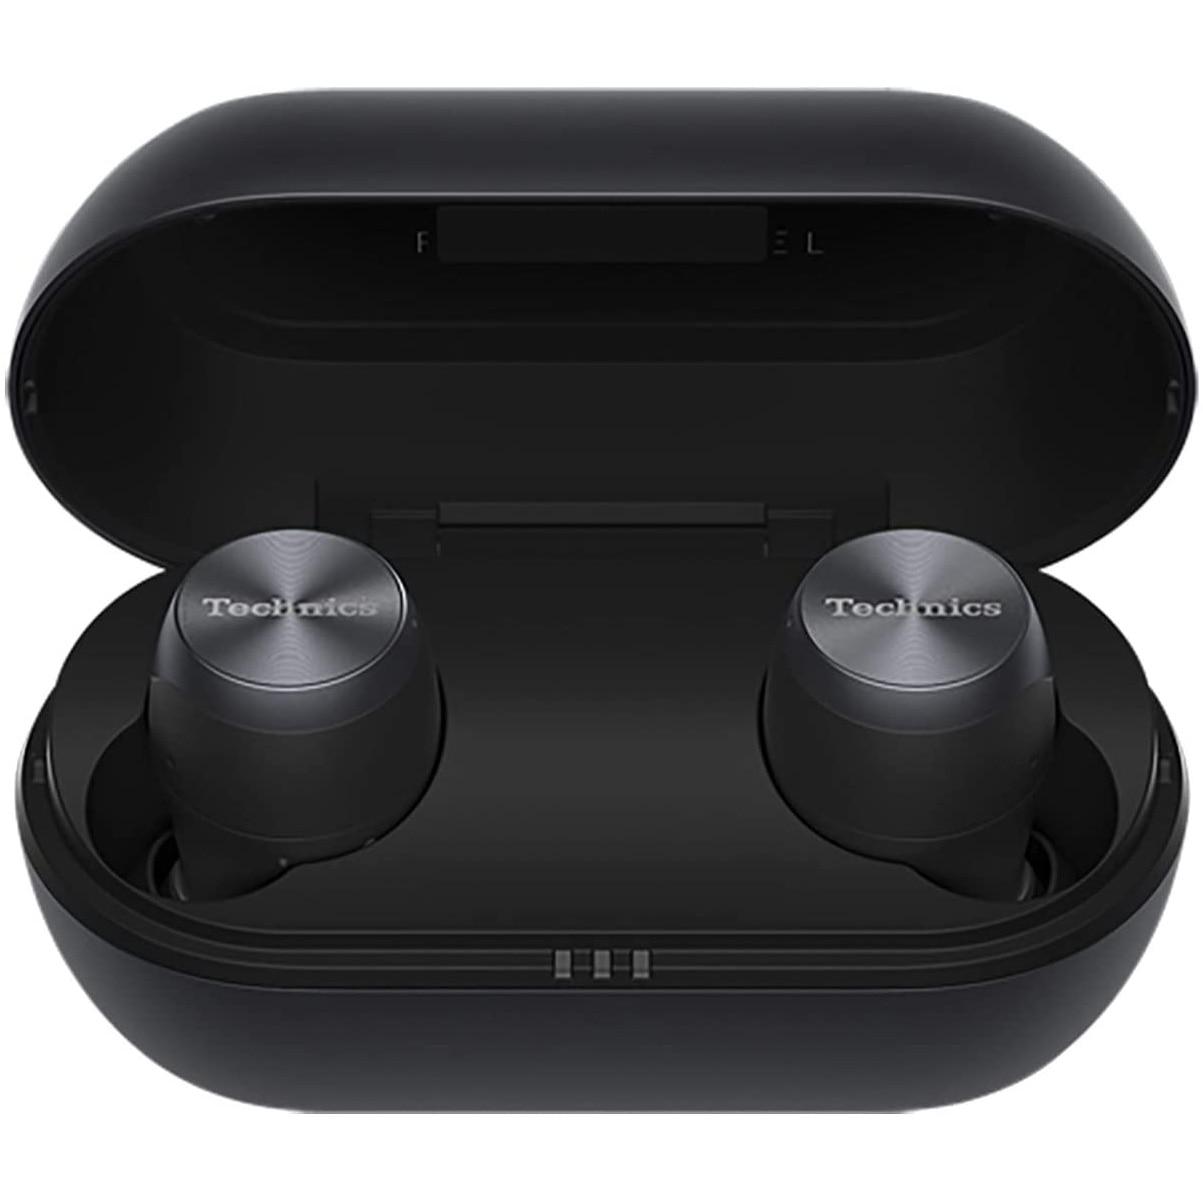 Fotografie Casti Audio In Ear Panasonic EAH-AZ70WE-K, True Wireless, Bluetooth, Noise cancelling, Microfon, Autonomie 6 ore, Negru